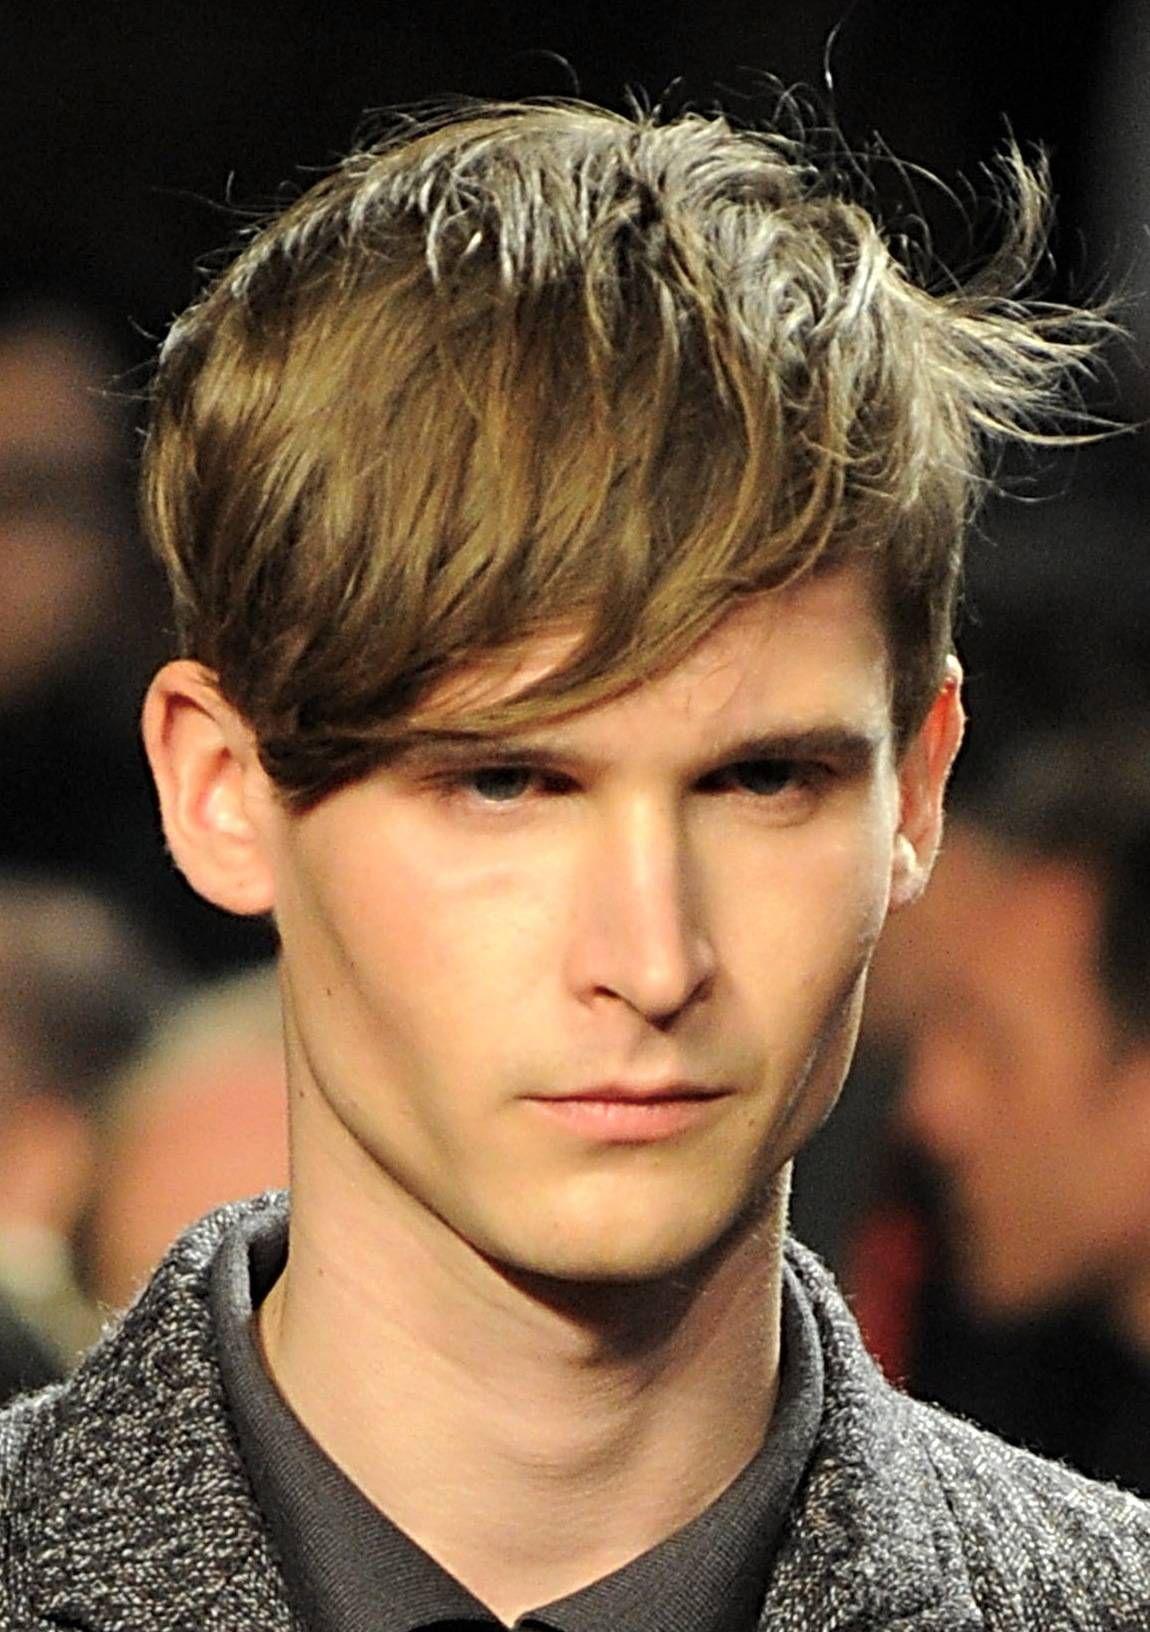 Messy Yet Stylish Hairstyles for Men